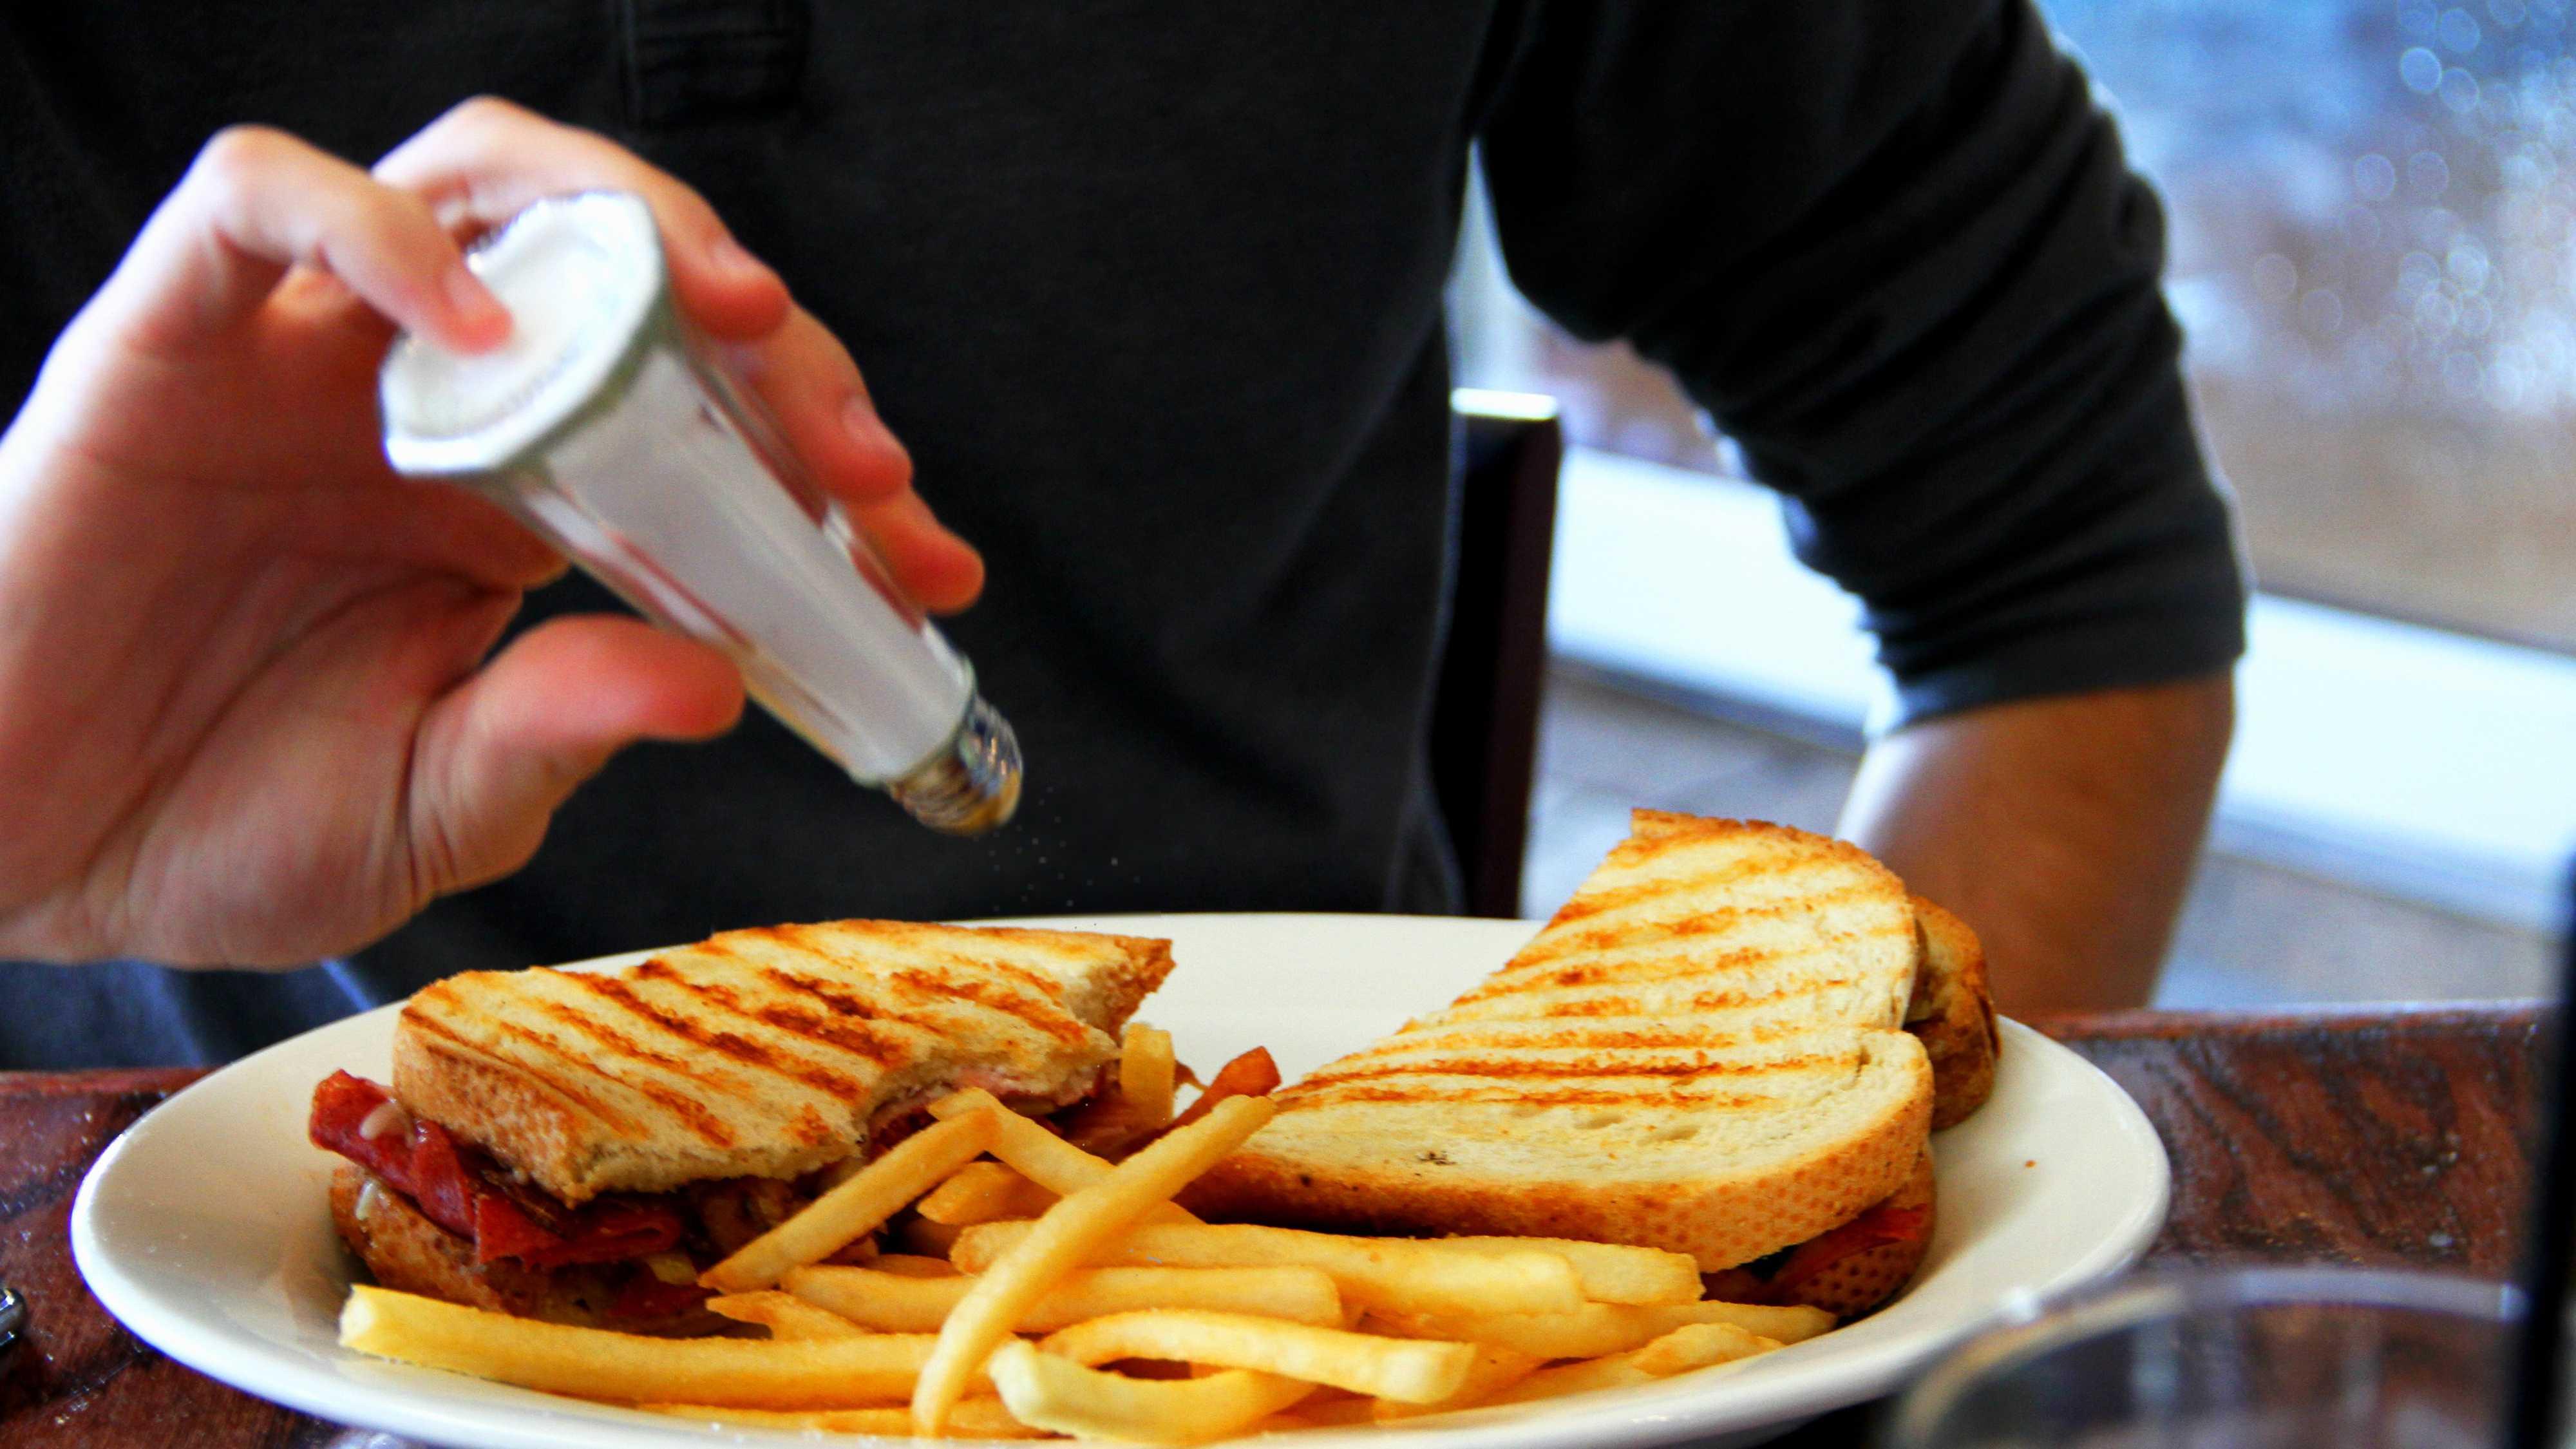 02_salting_sandwich.jpg